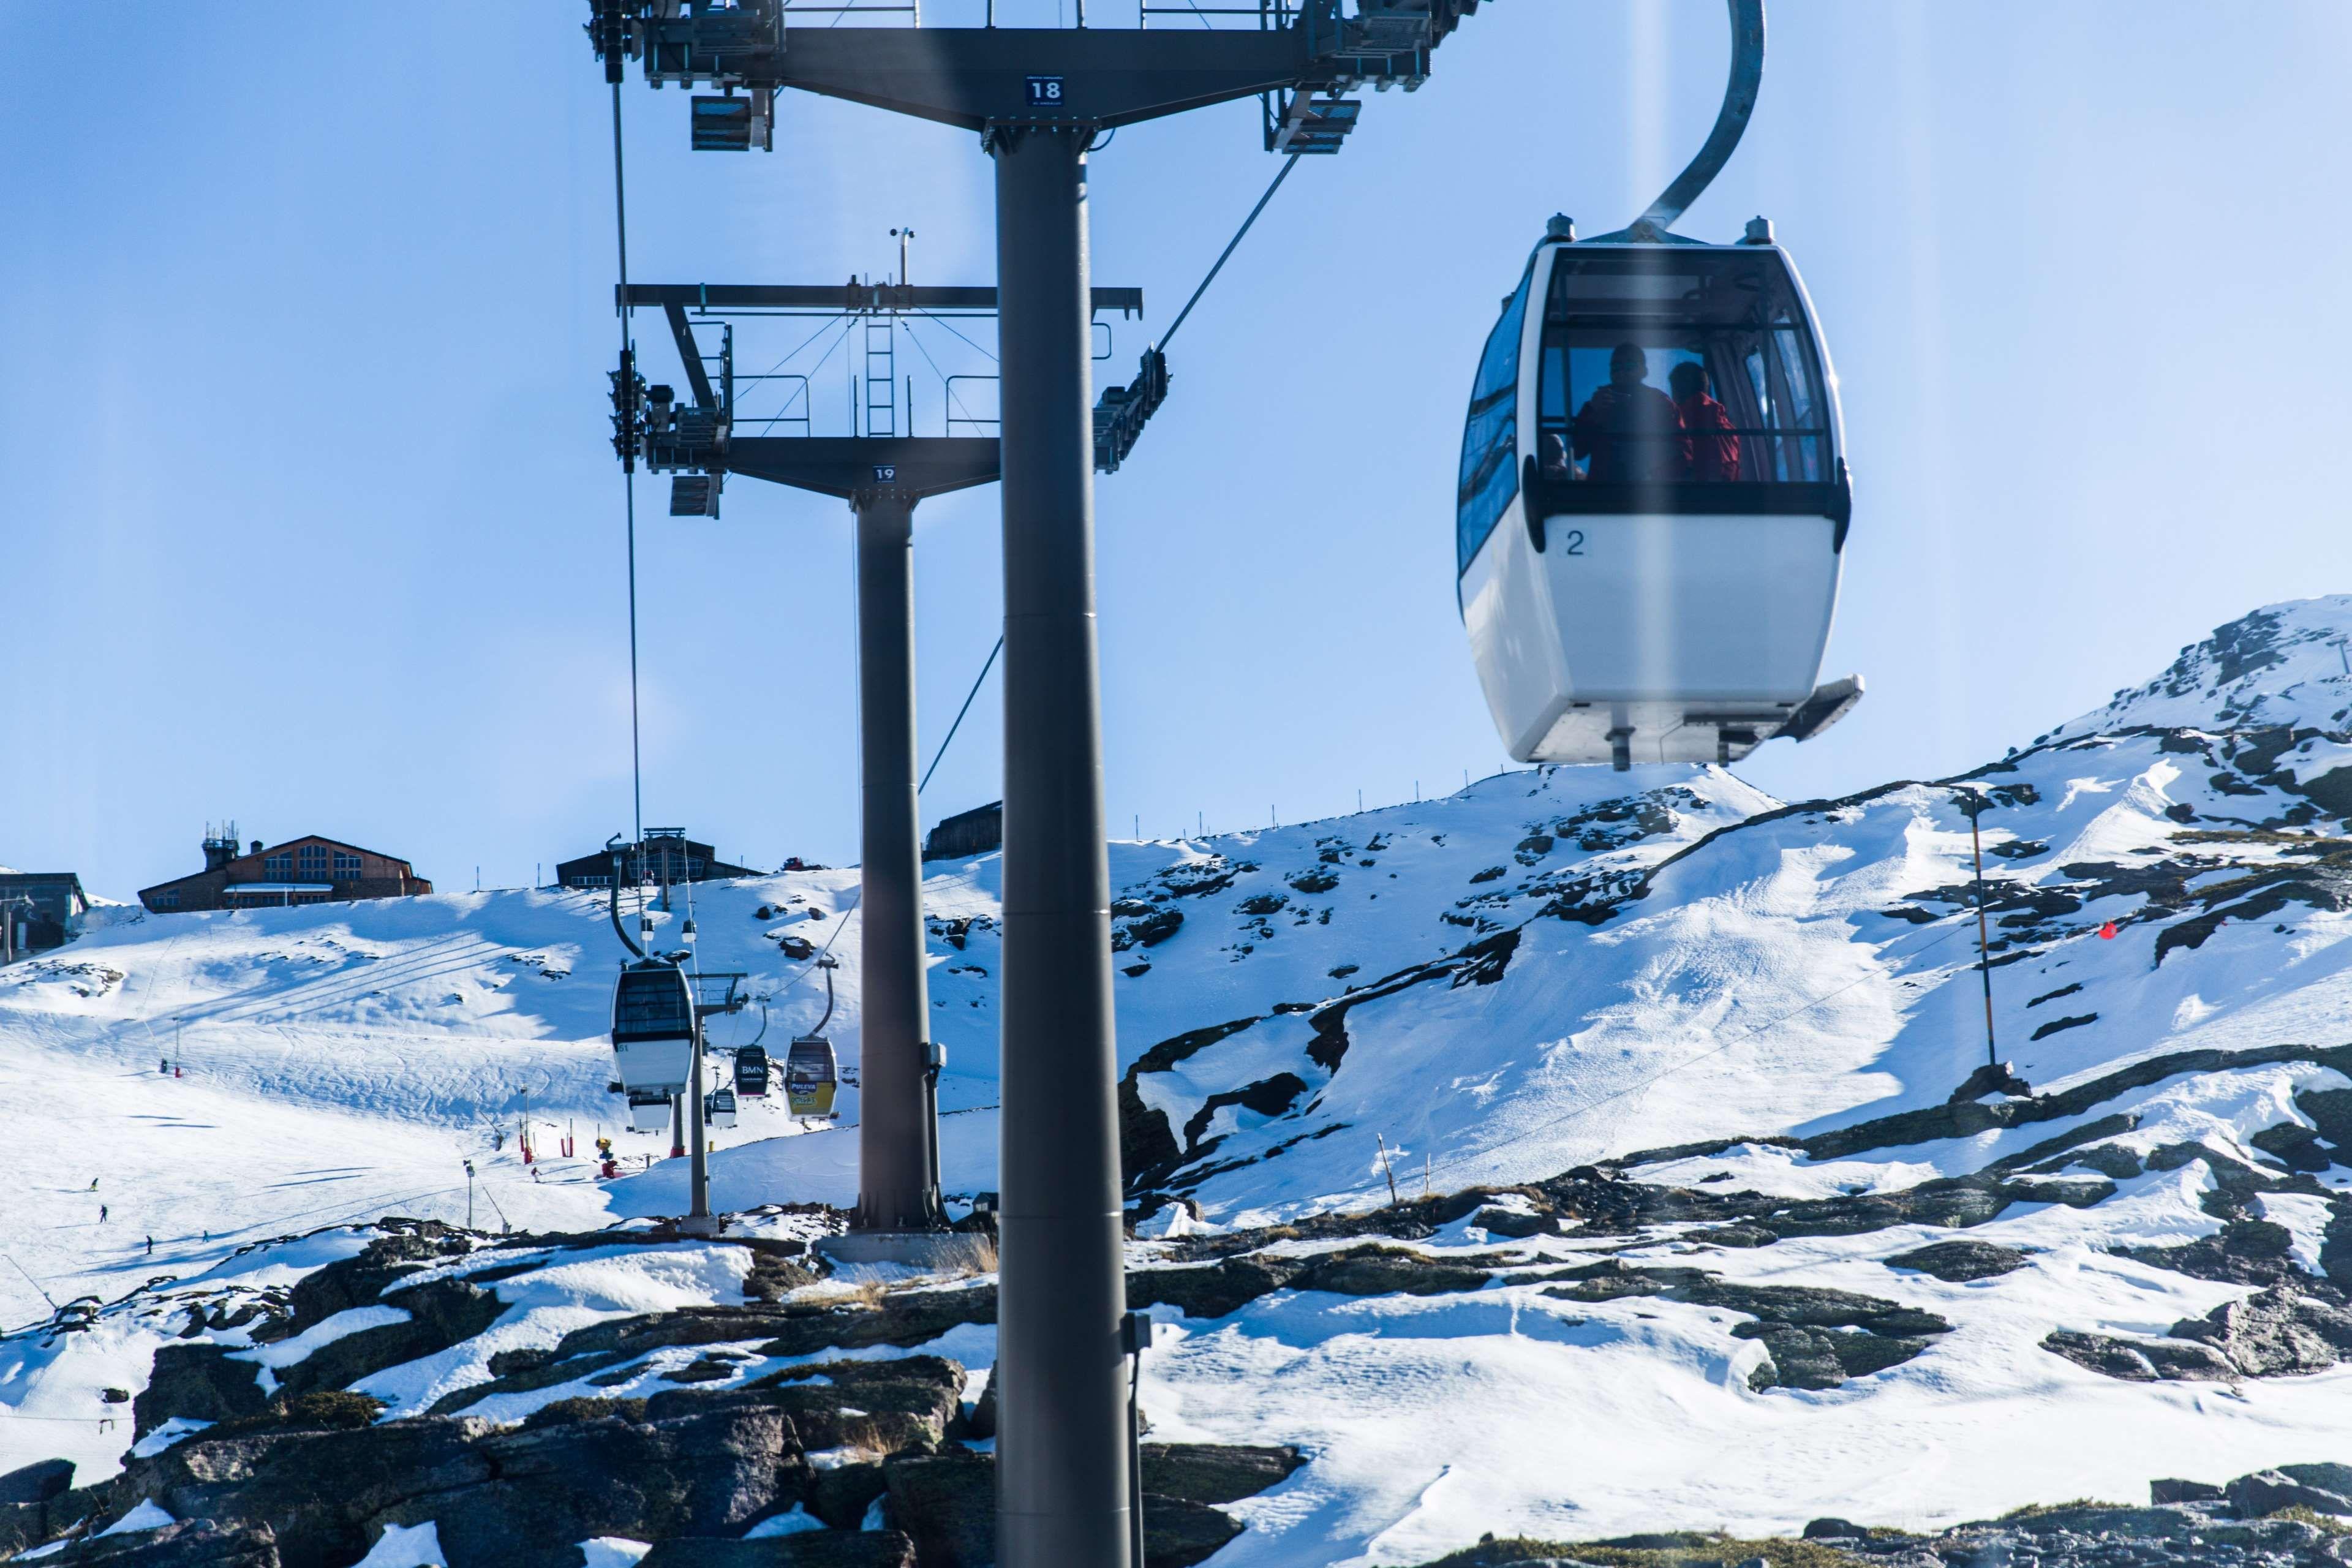 Cable Car Cold Freezing Frost Frozen Ice Landscape Mountain Mountain Peak Outdoors Recreation Resort Scenic Ski Ski Lift Ski Resort Ski Slope